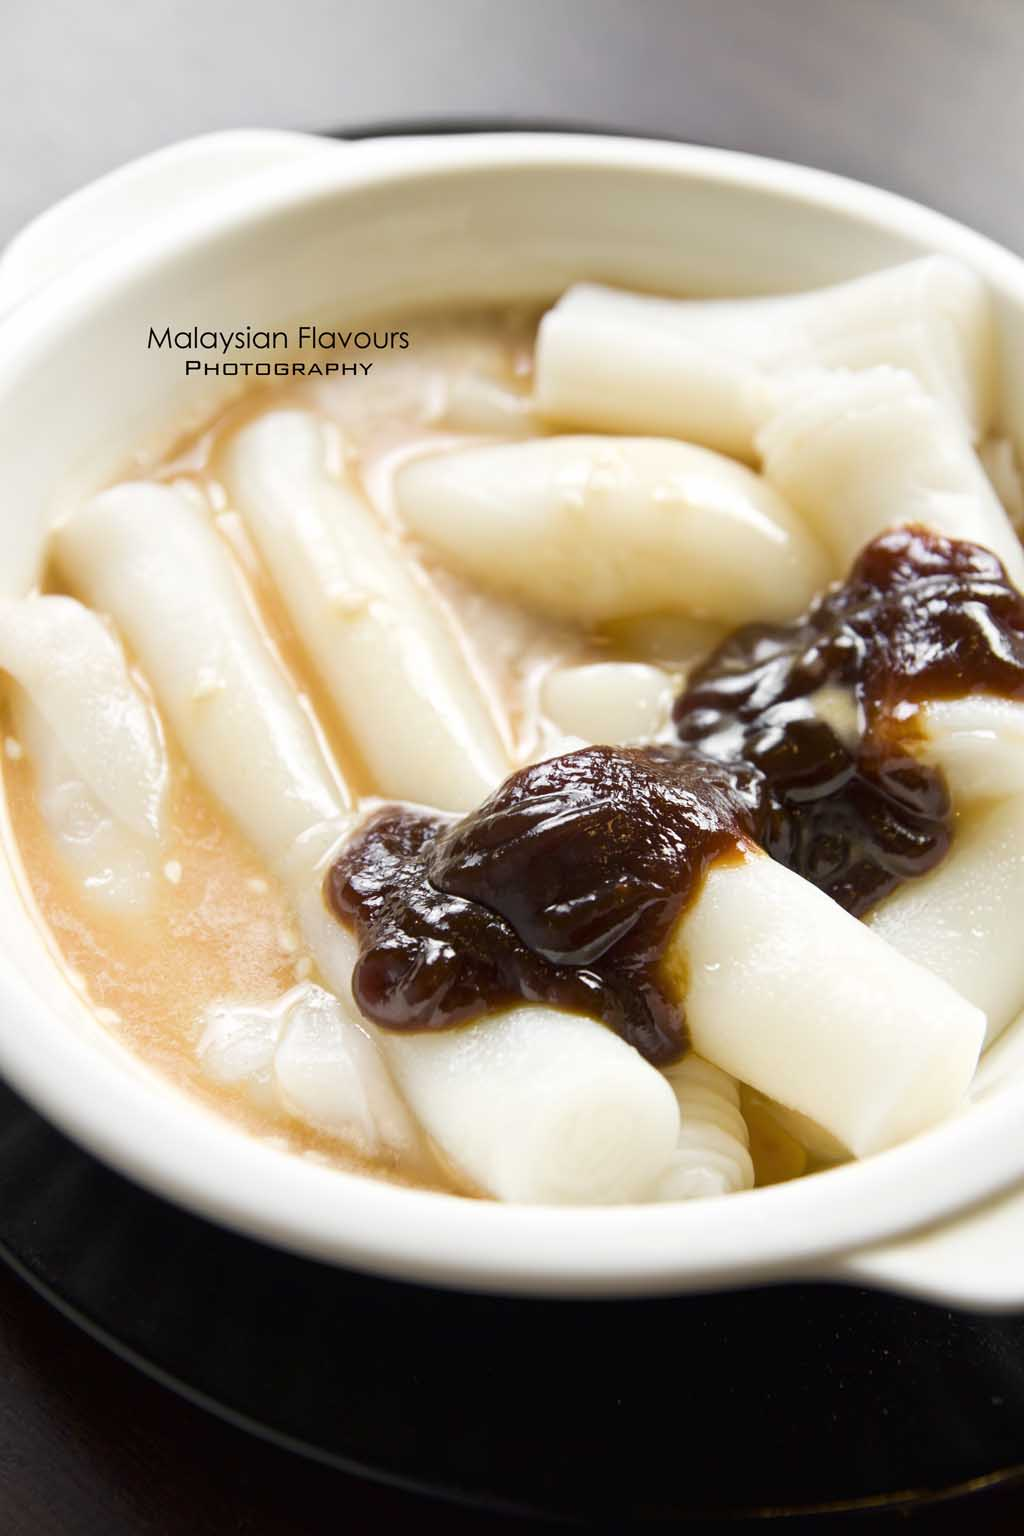 peanut-sweet-sauce-cheong-fun